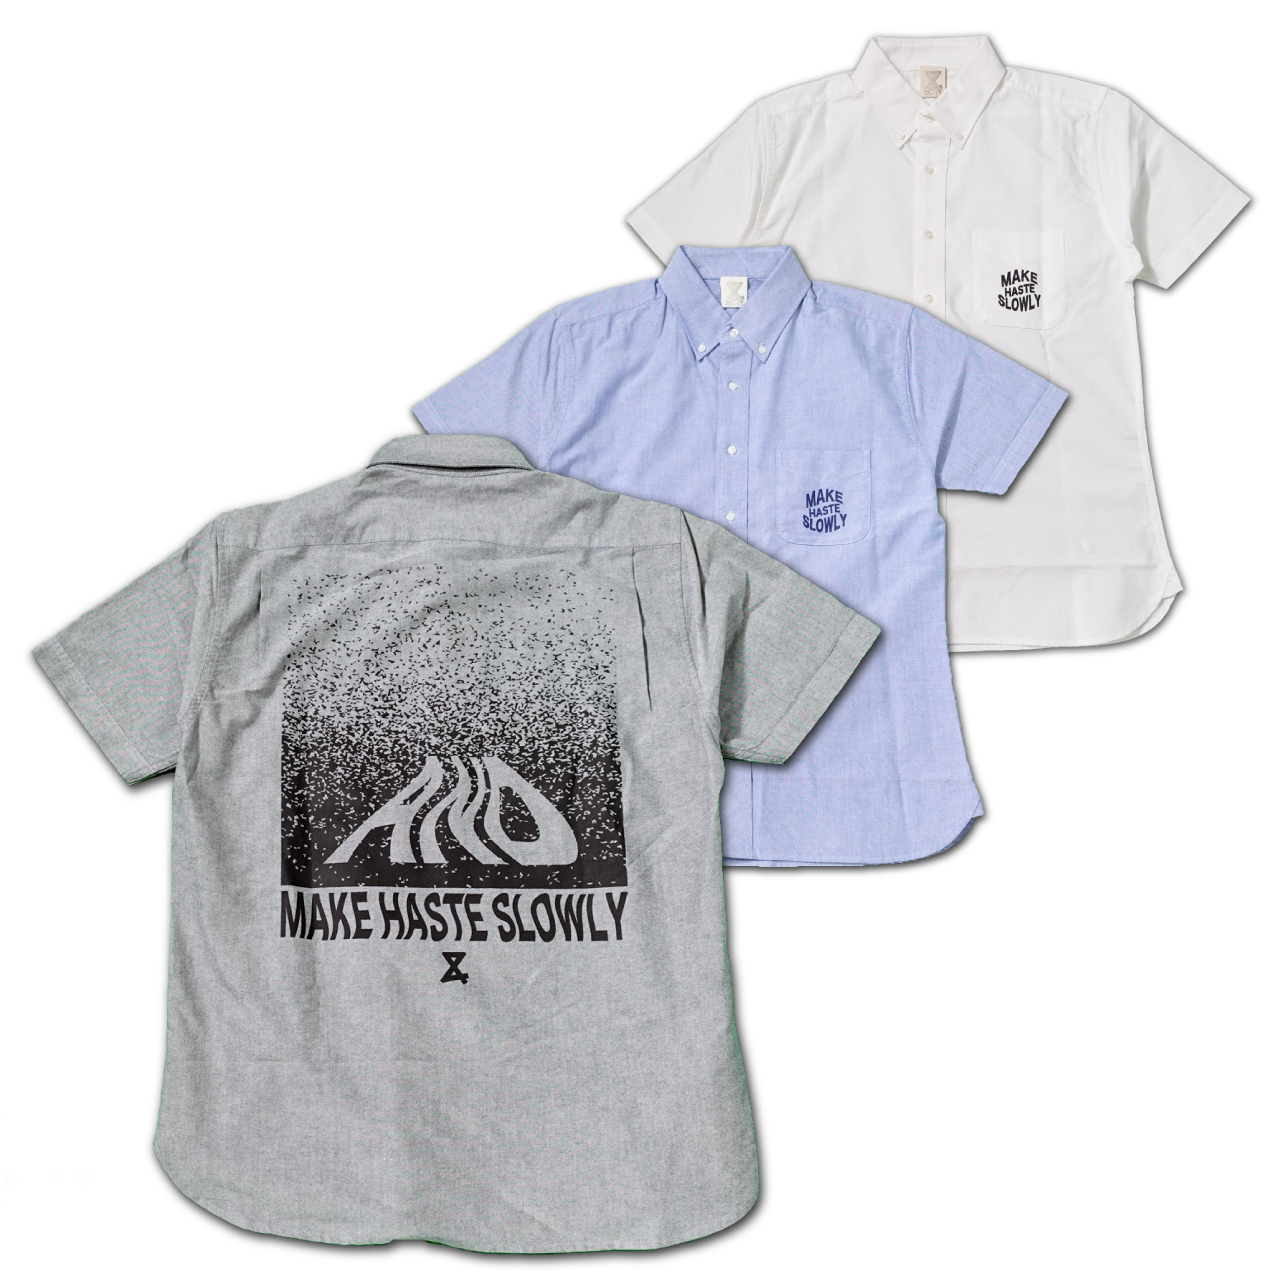 MAKE HASTE SLOWLY Short sleeve Oxford shirt